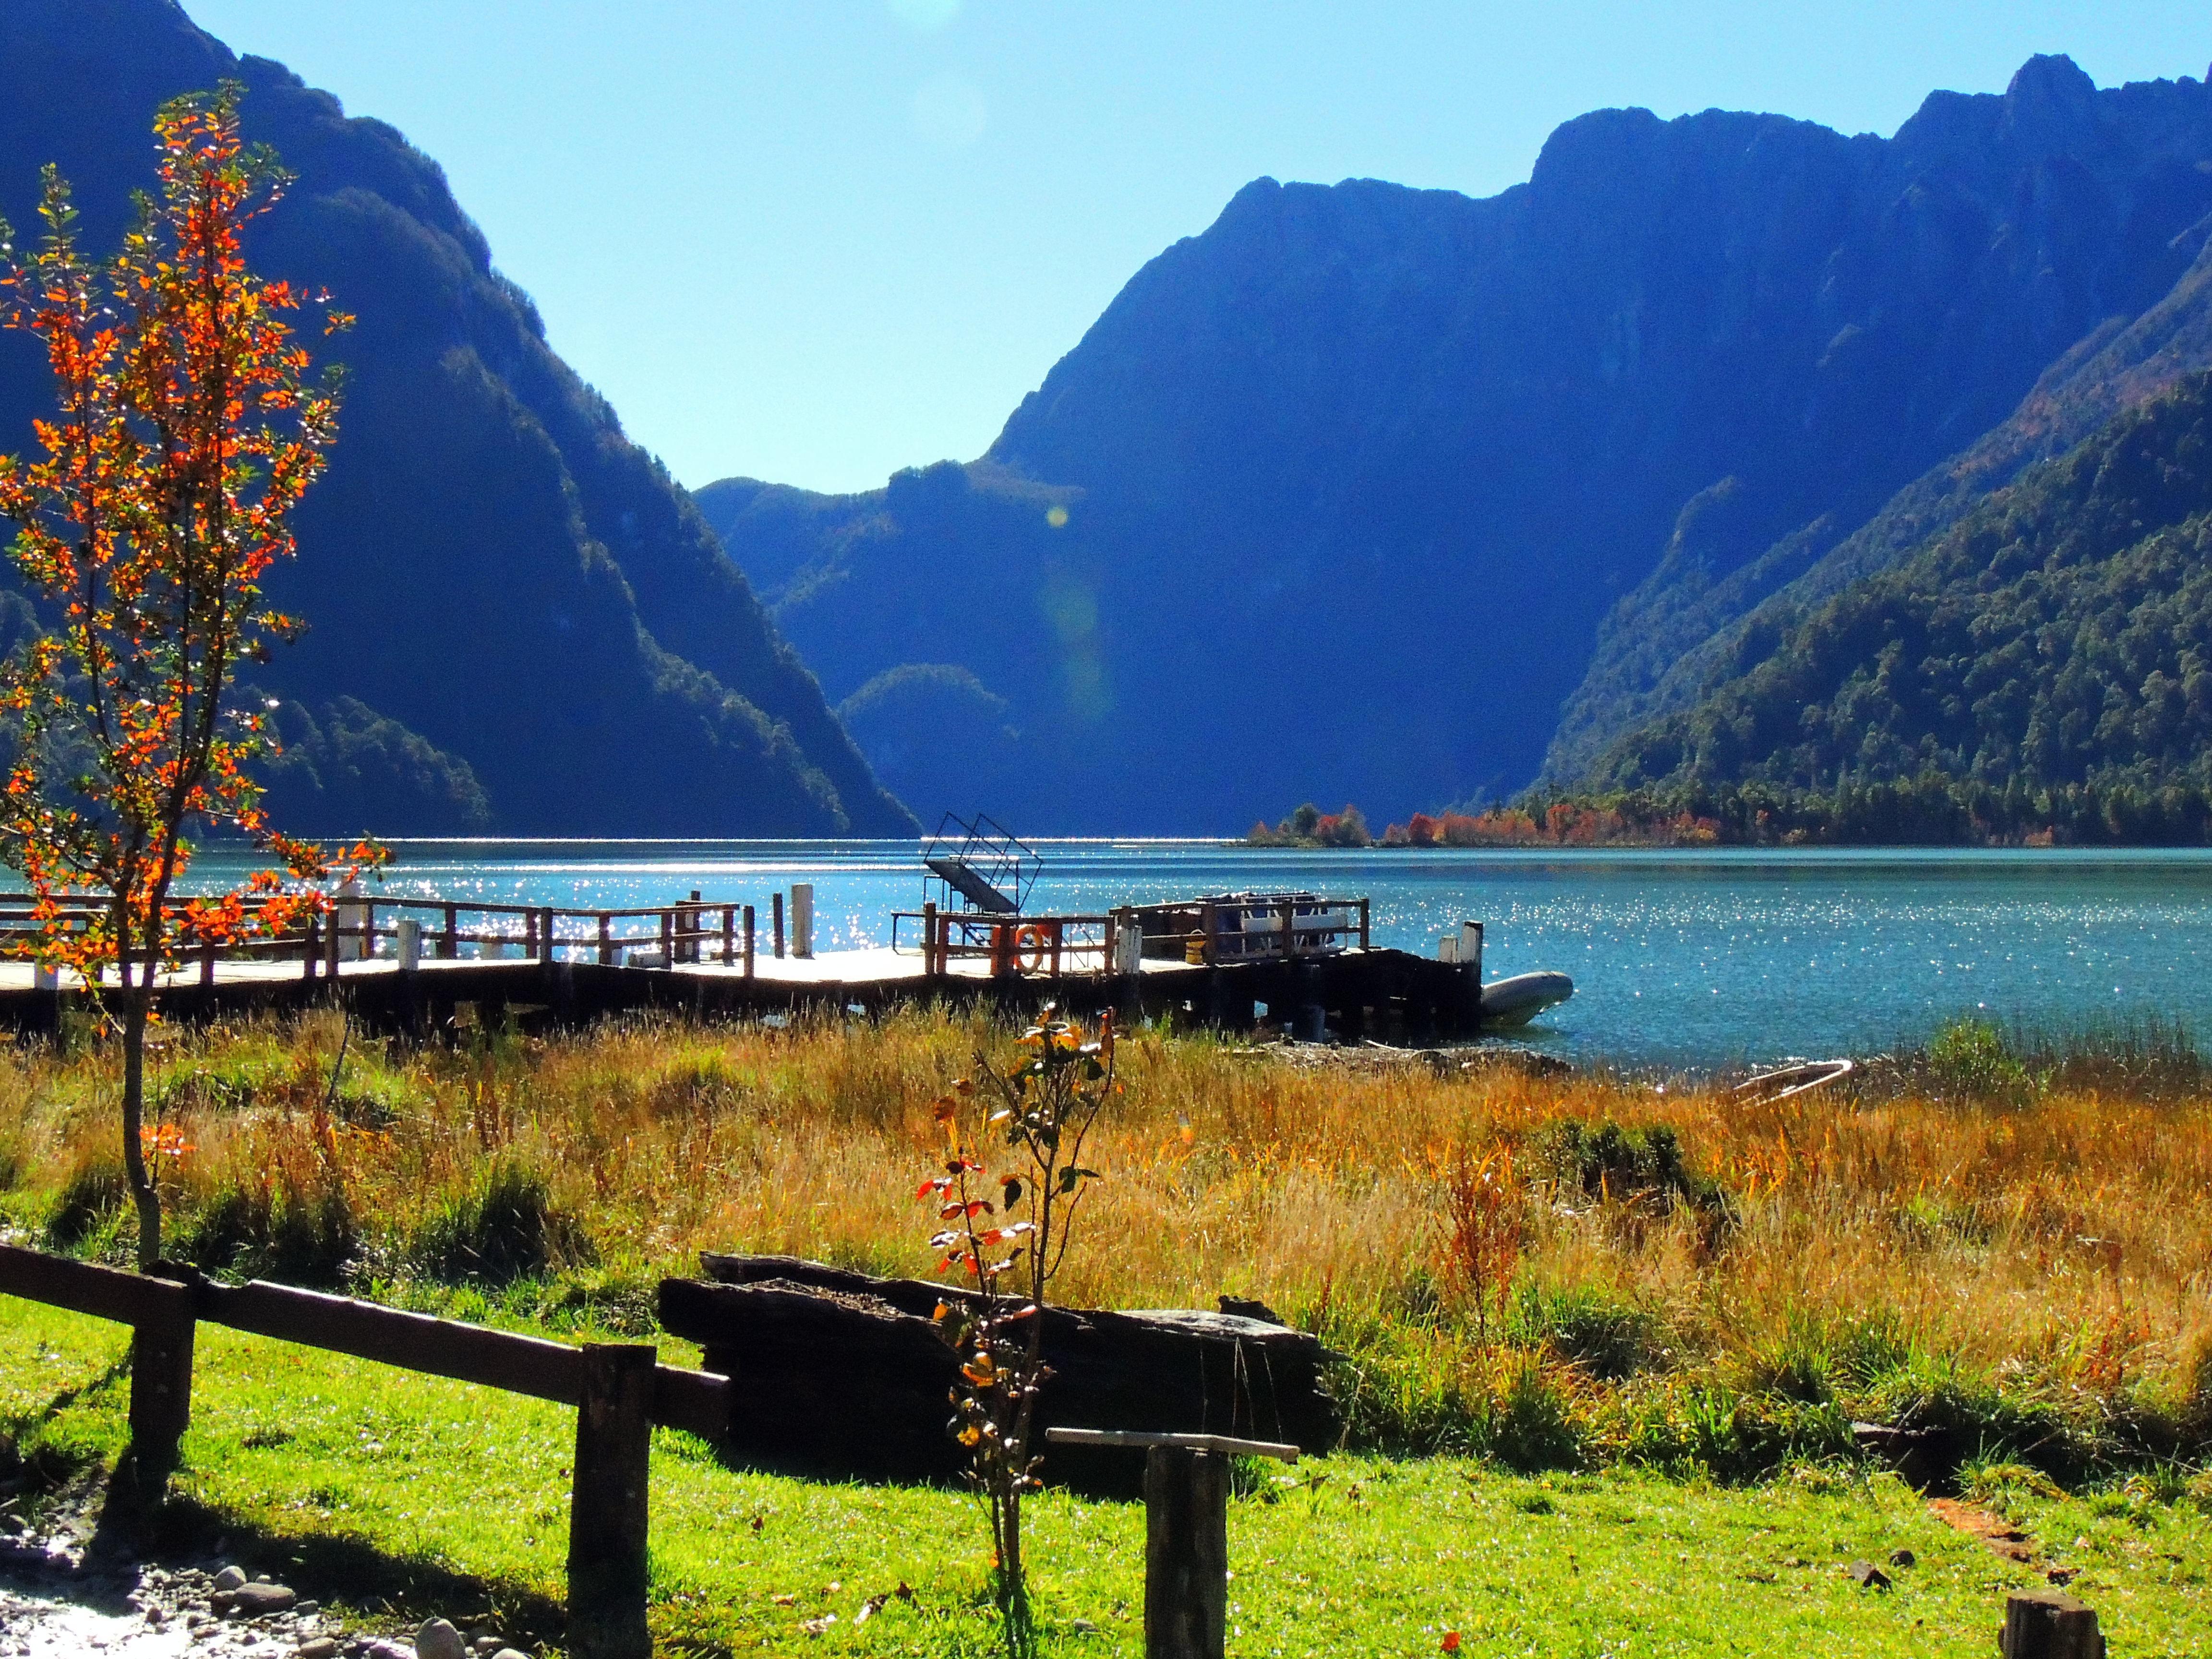 «Lago Frías, Argentina» por Vivi Gualhanone - Flickr: Lago Frías, Argentina (Maio/2014). Disponible bajo la licencia CC BY 2.0 vía Wikimedia Commons.